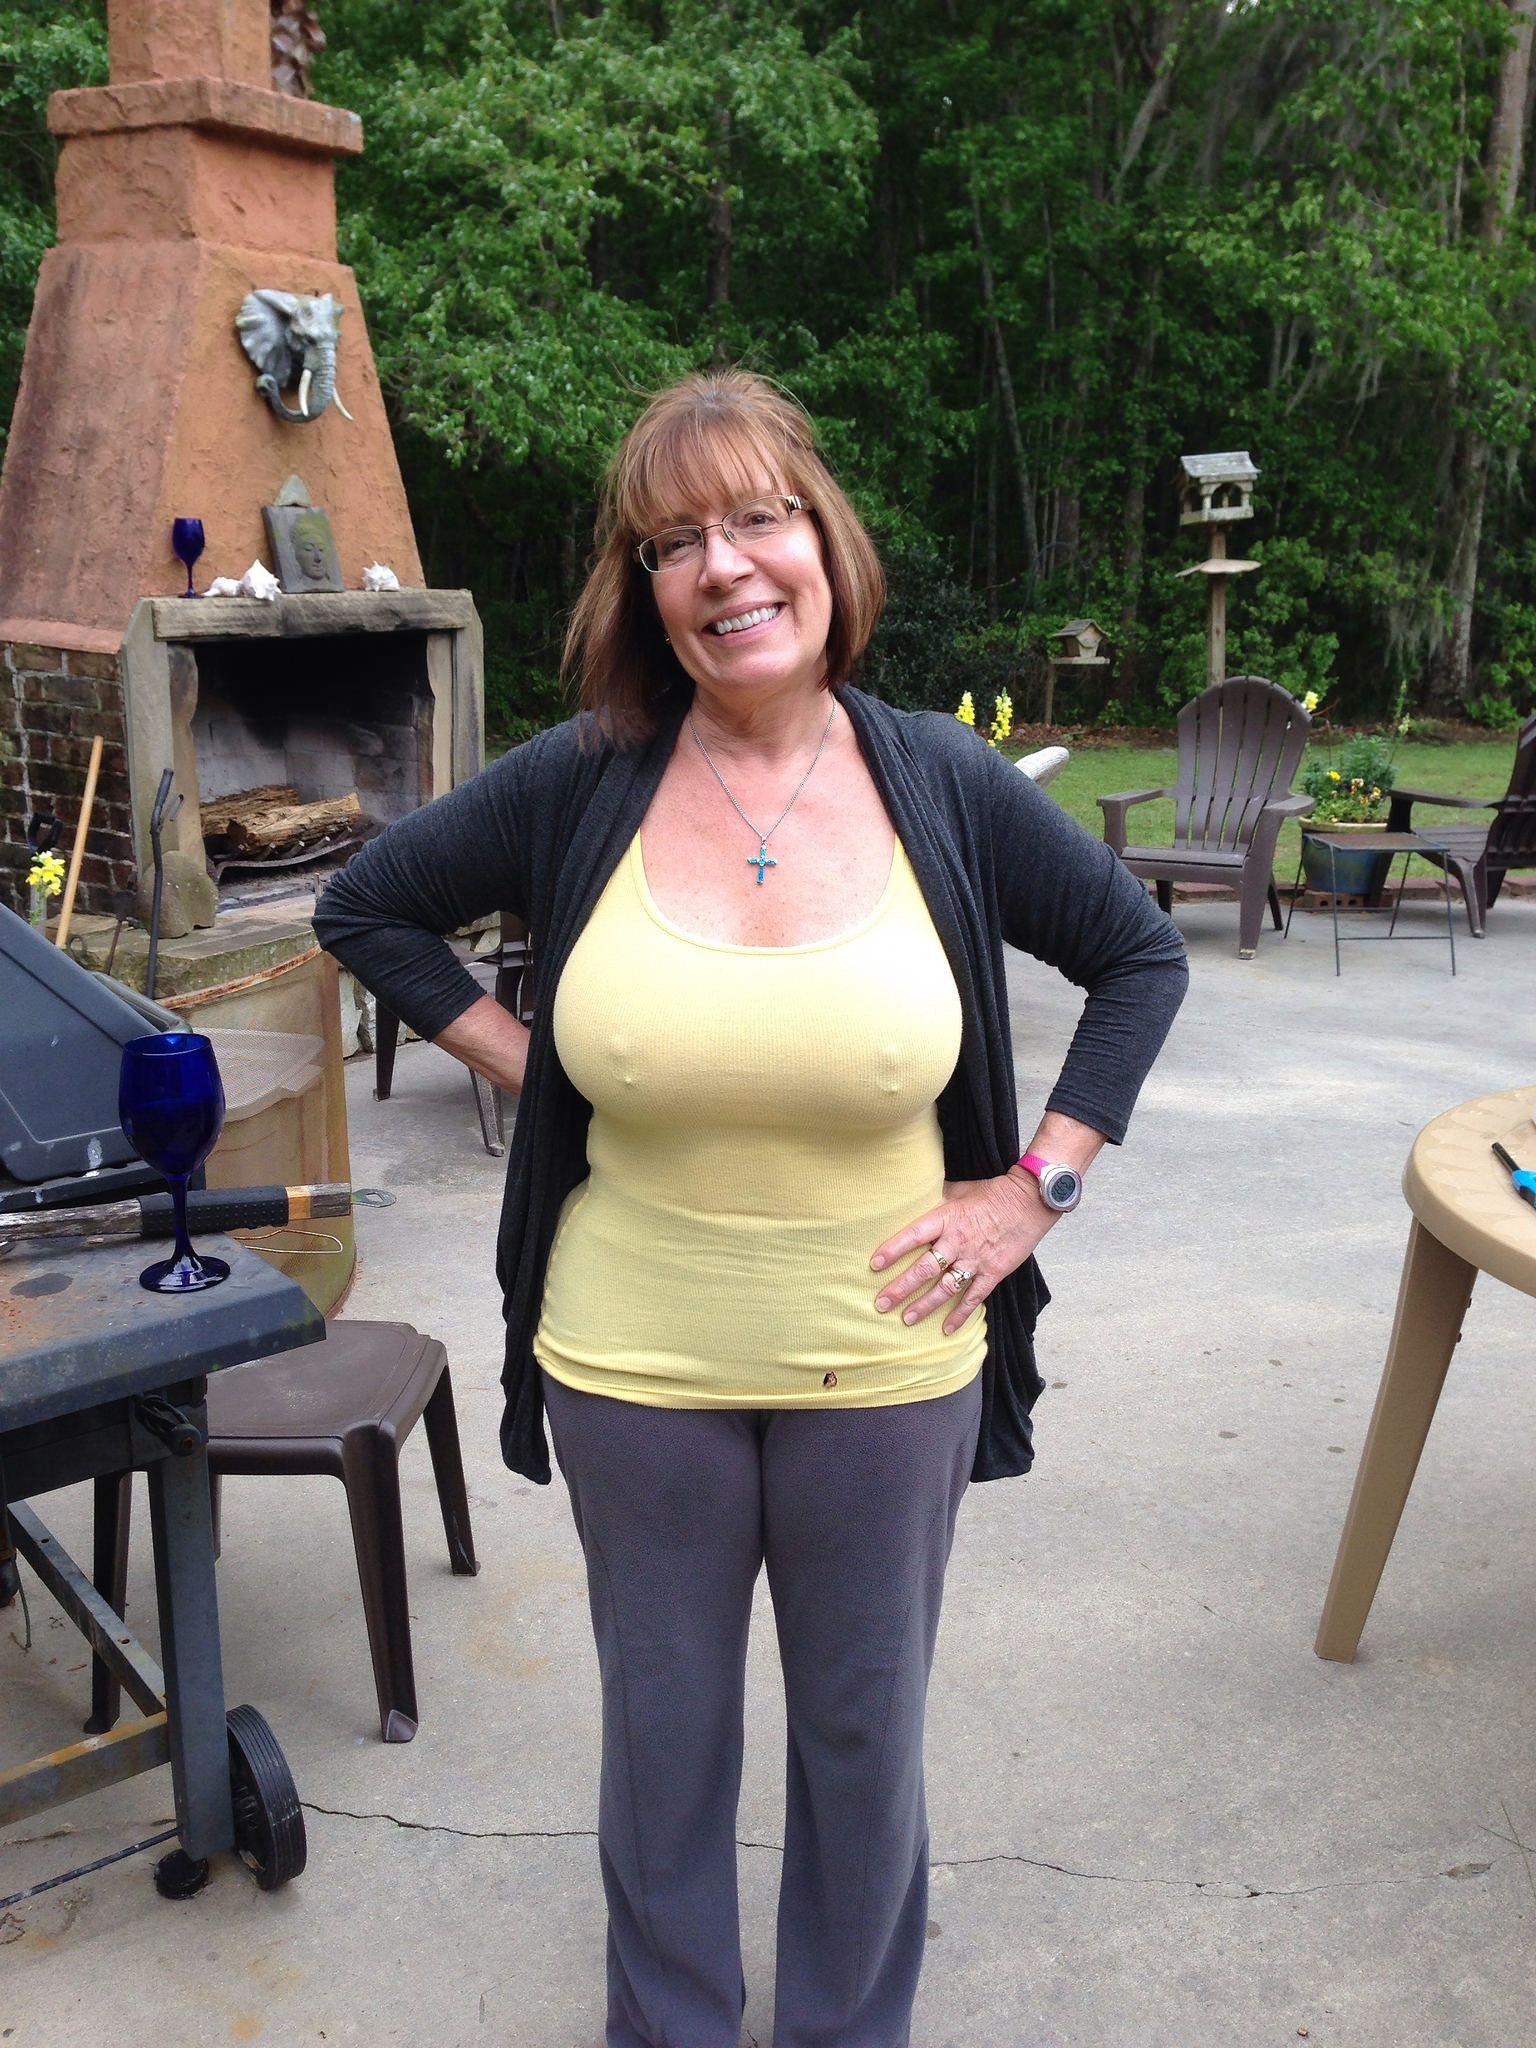 best of Swinger georgia Housewife